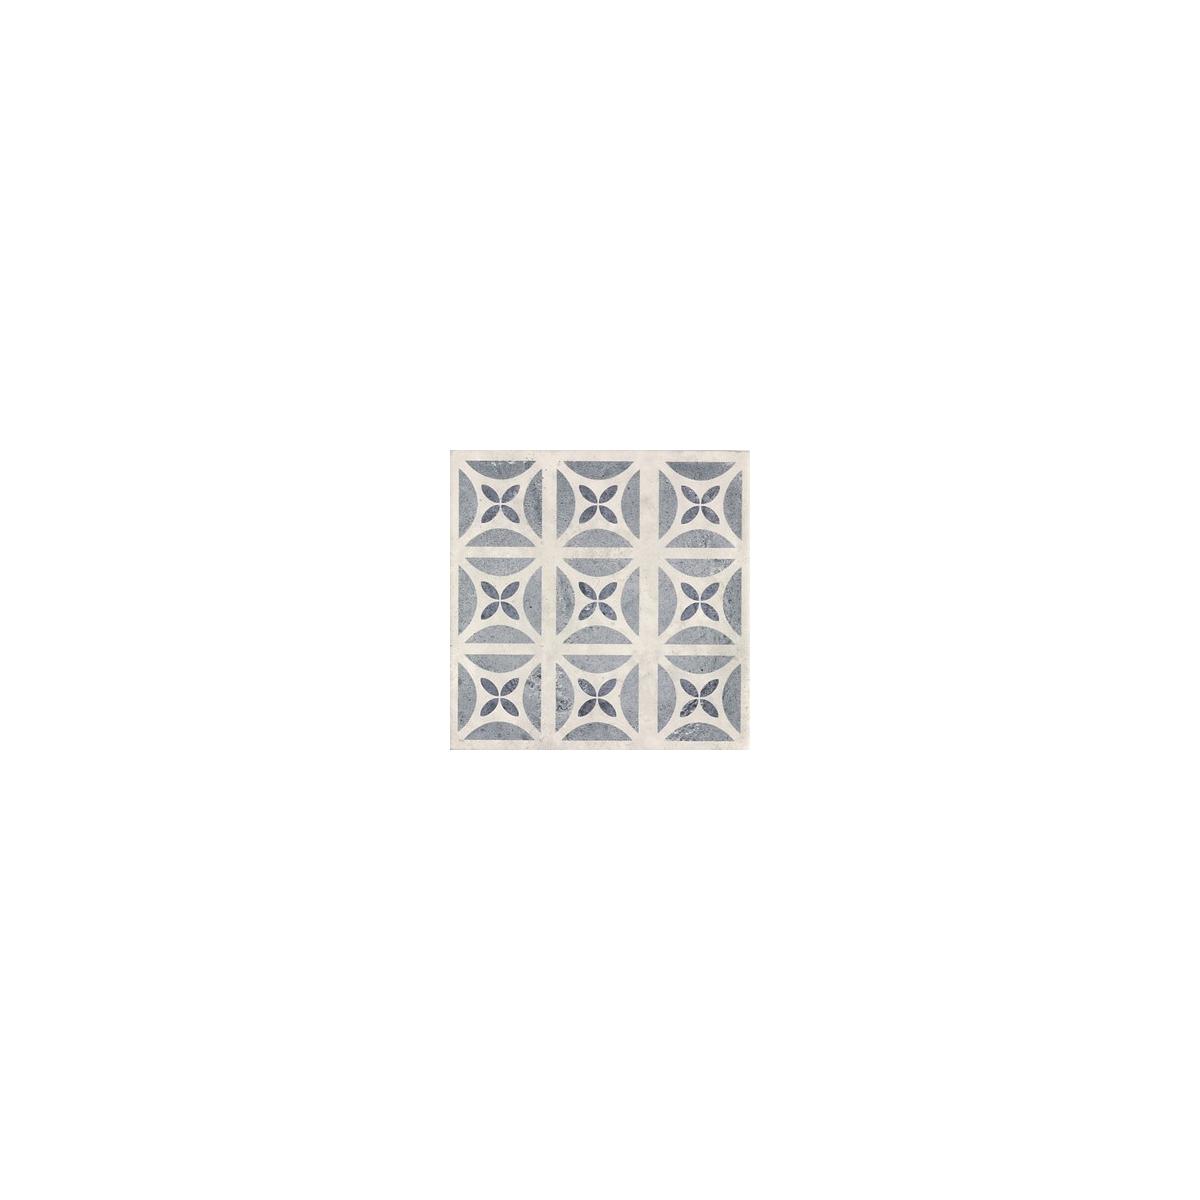 Decor Antiqua (m2) - Azulejos para interiores como Entrada al mejor precio